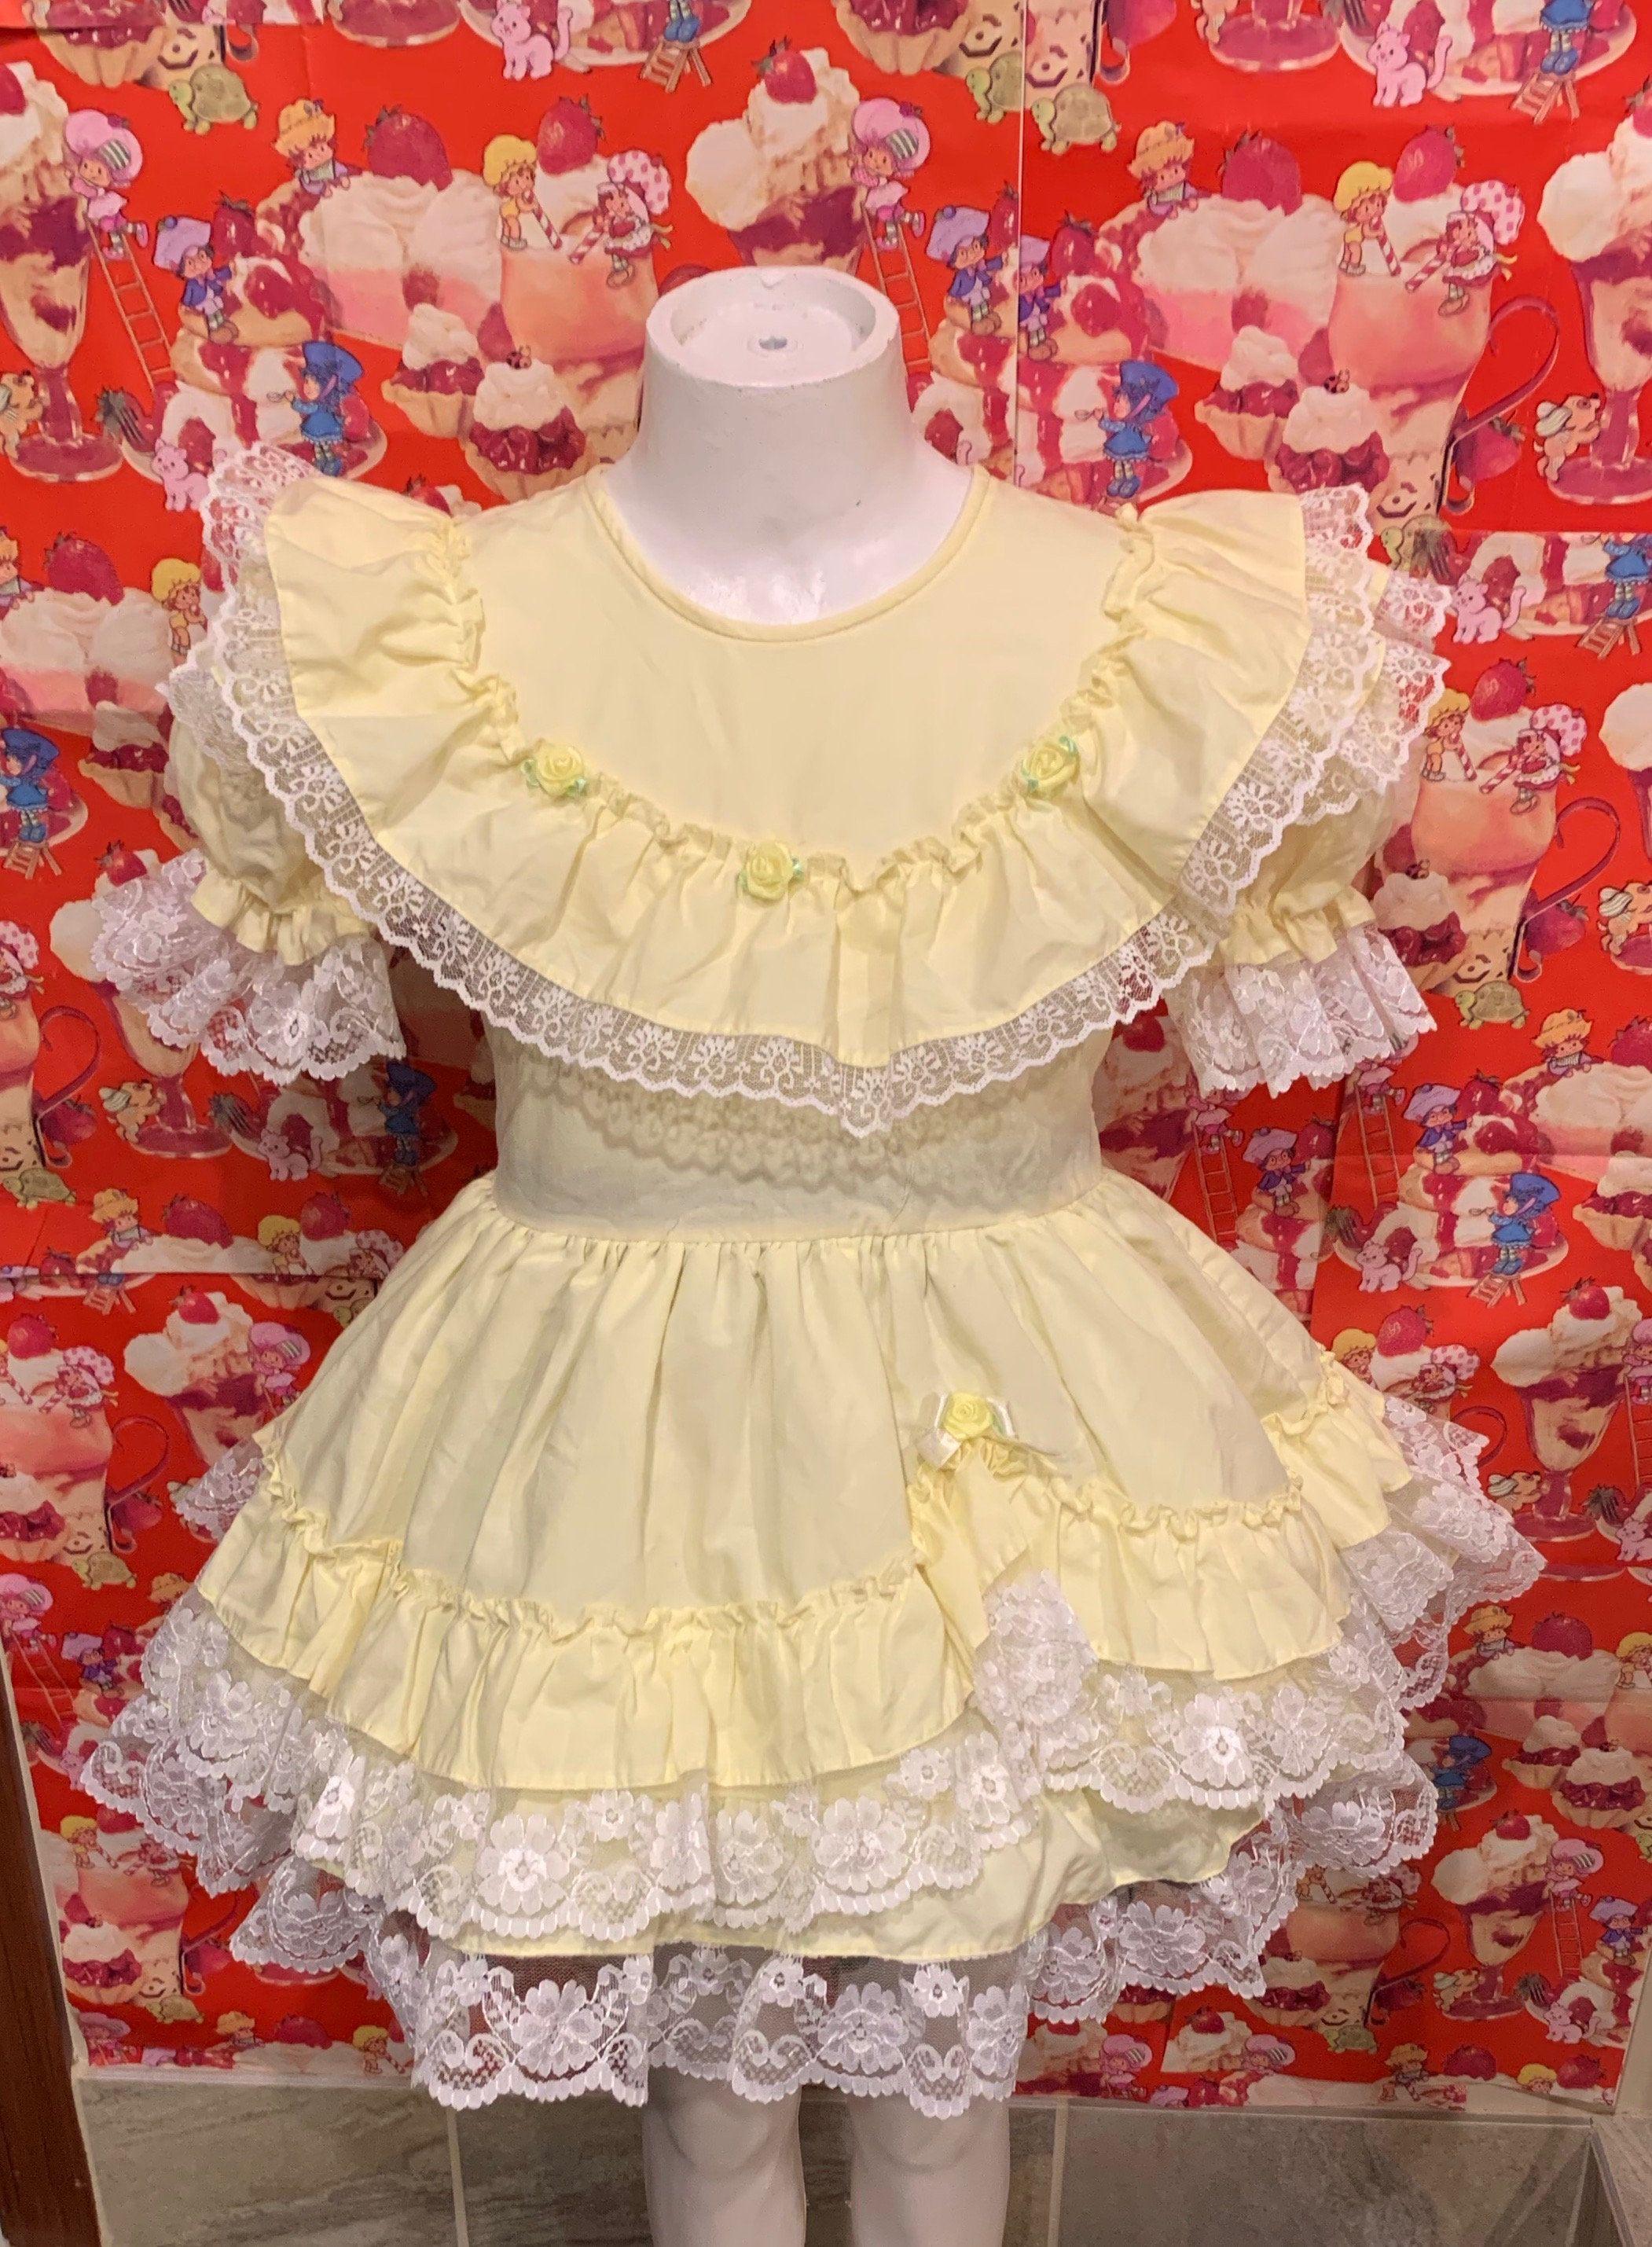 Yellow Ruffle Dress 4t Etsy 4t Dress Ruffle Dress Vintage Kids Clothes [ 2859 x 2102 Pixel ]